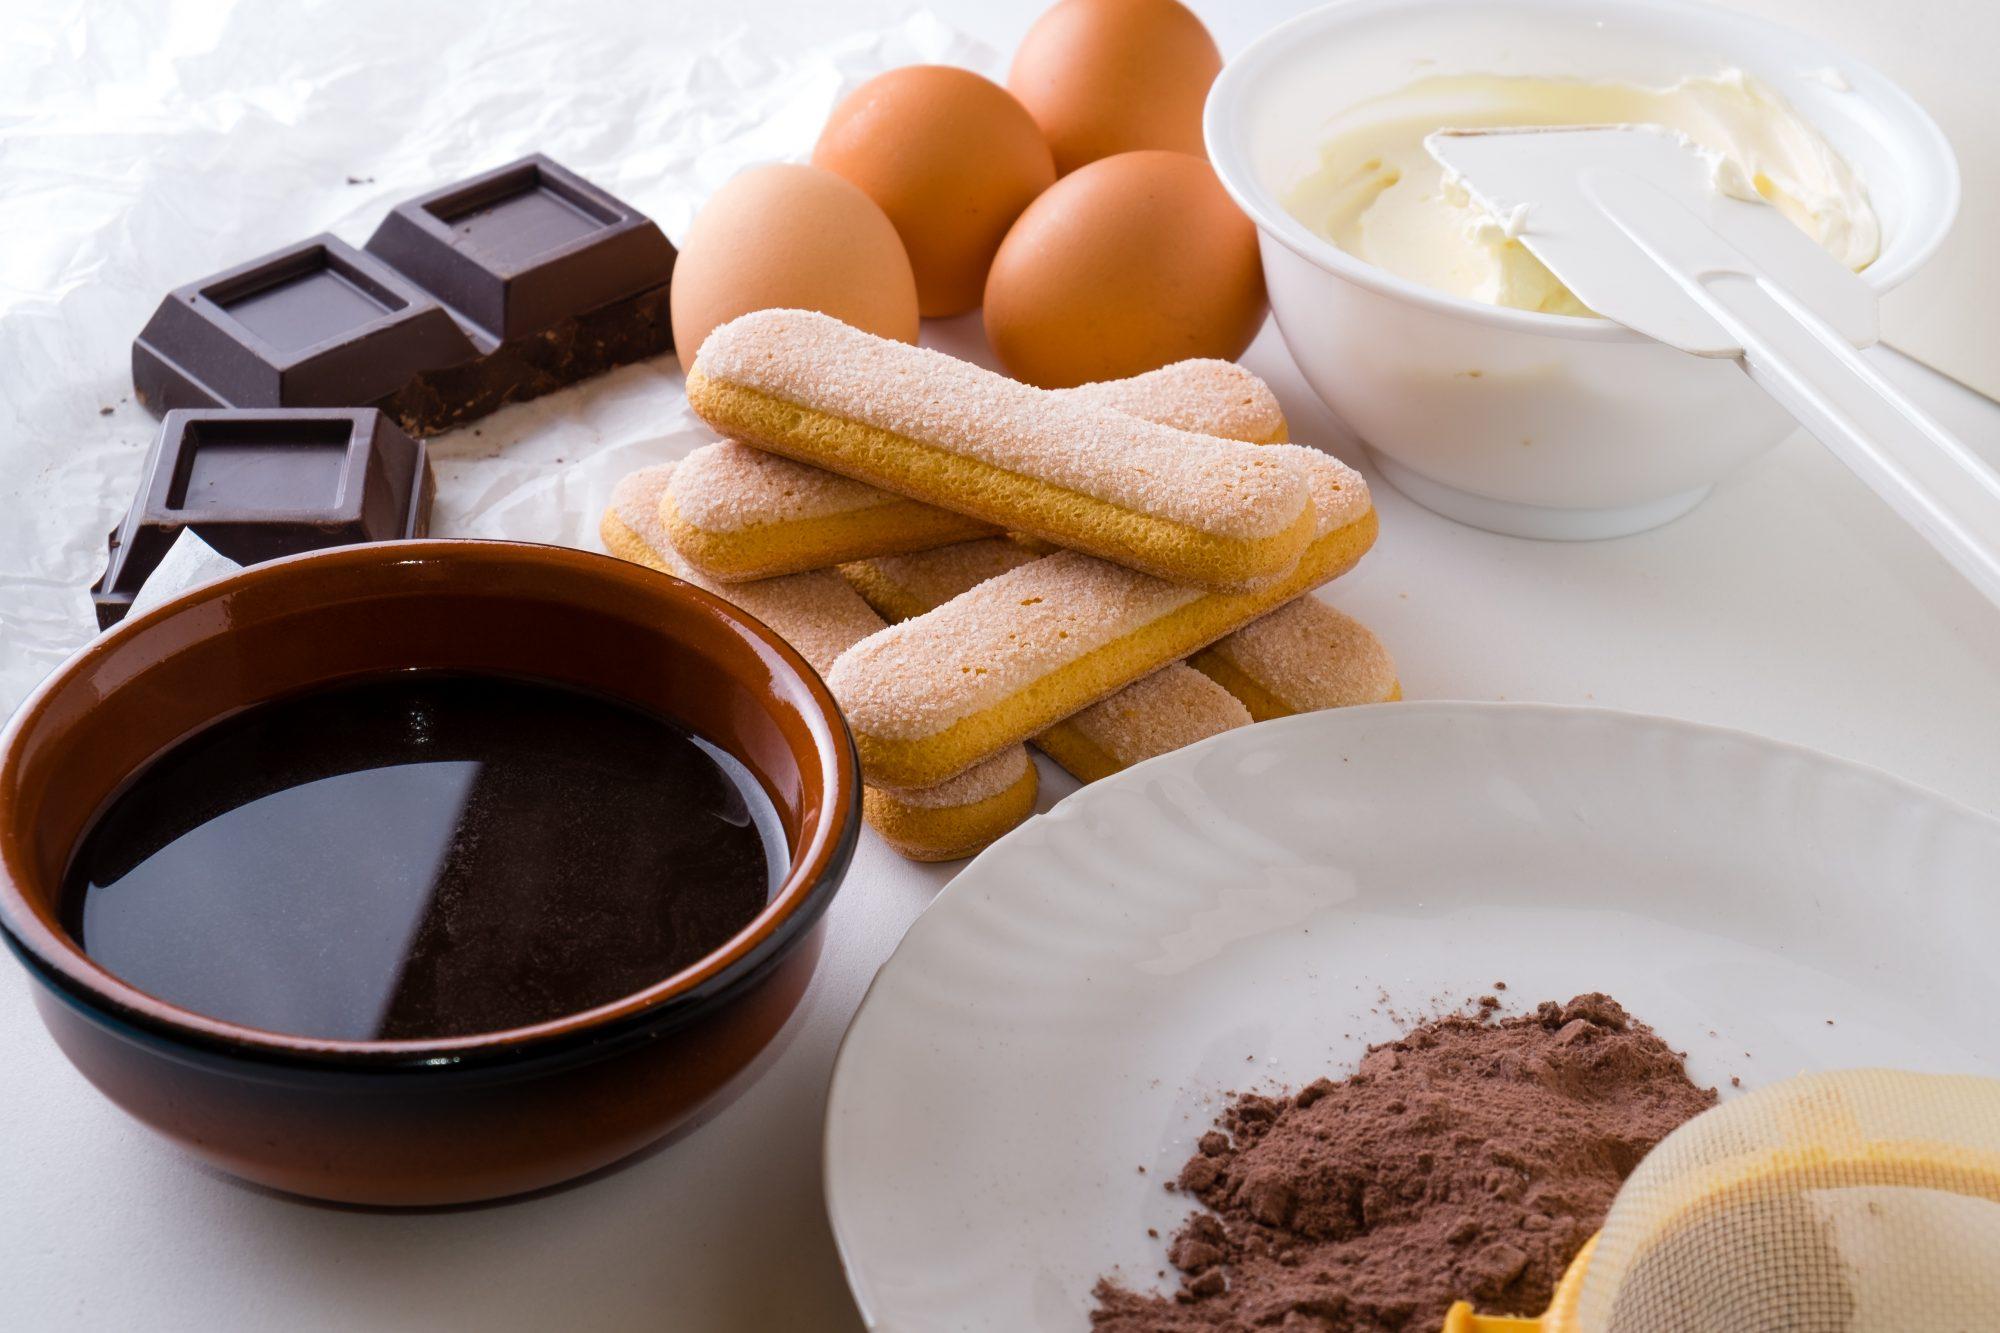 12318_Getty Tiramisu Ingredients